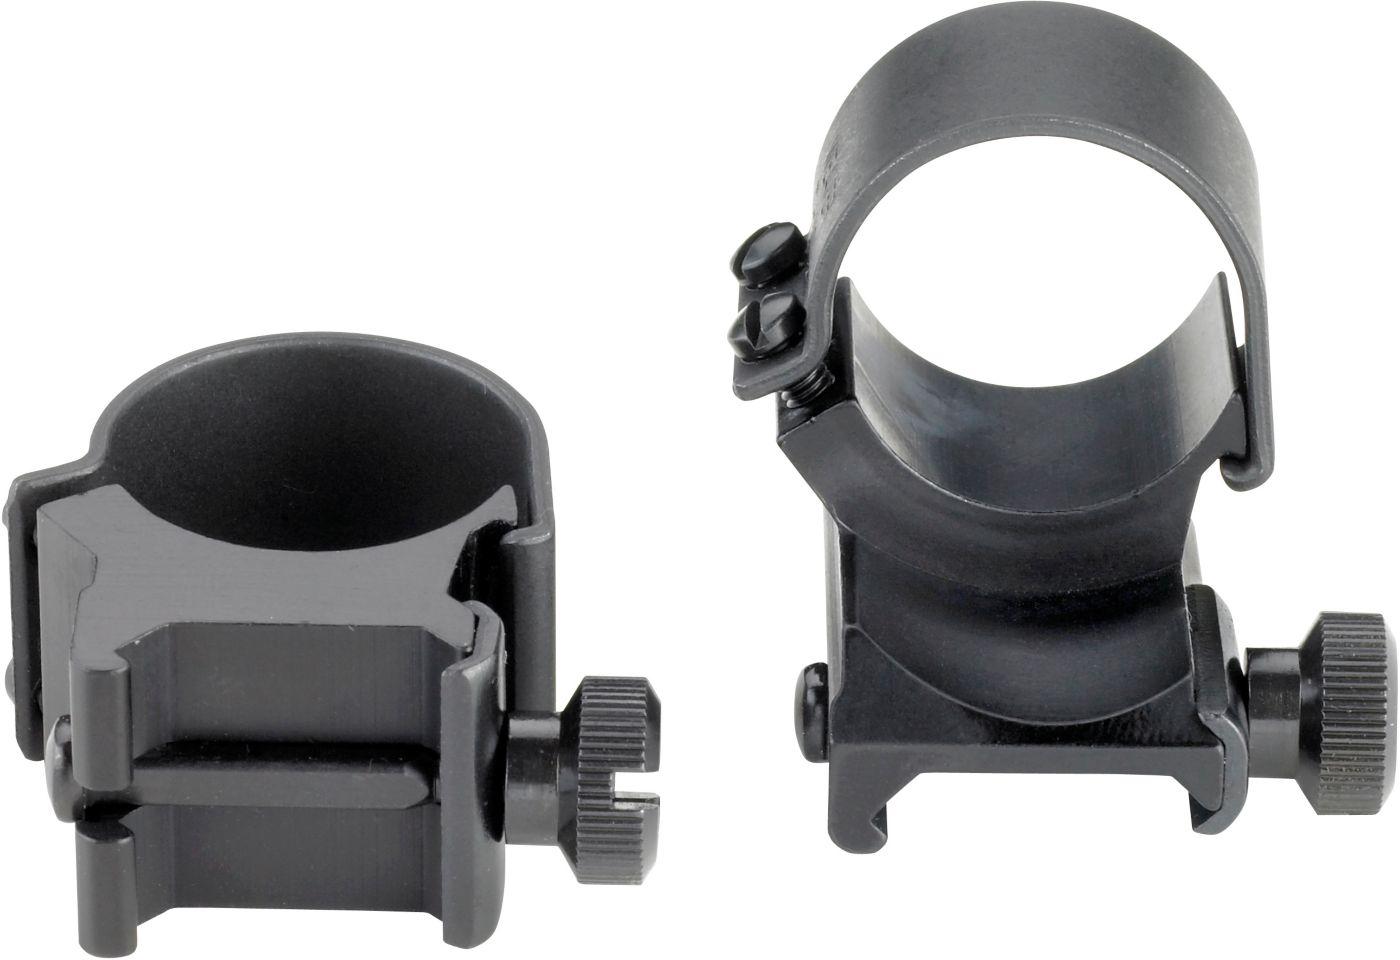 Weaver Dual Detachable Extension 1 Inch Medium Scope Rings